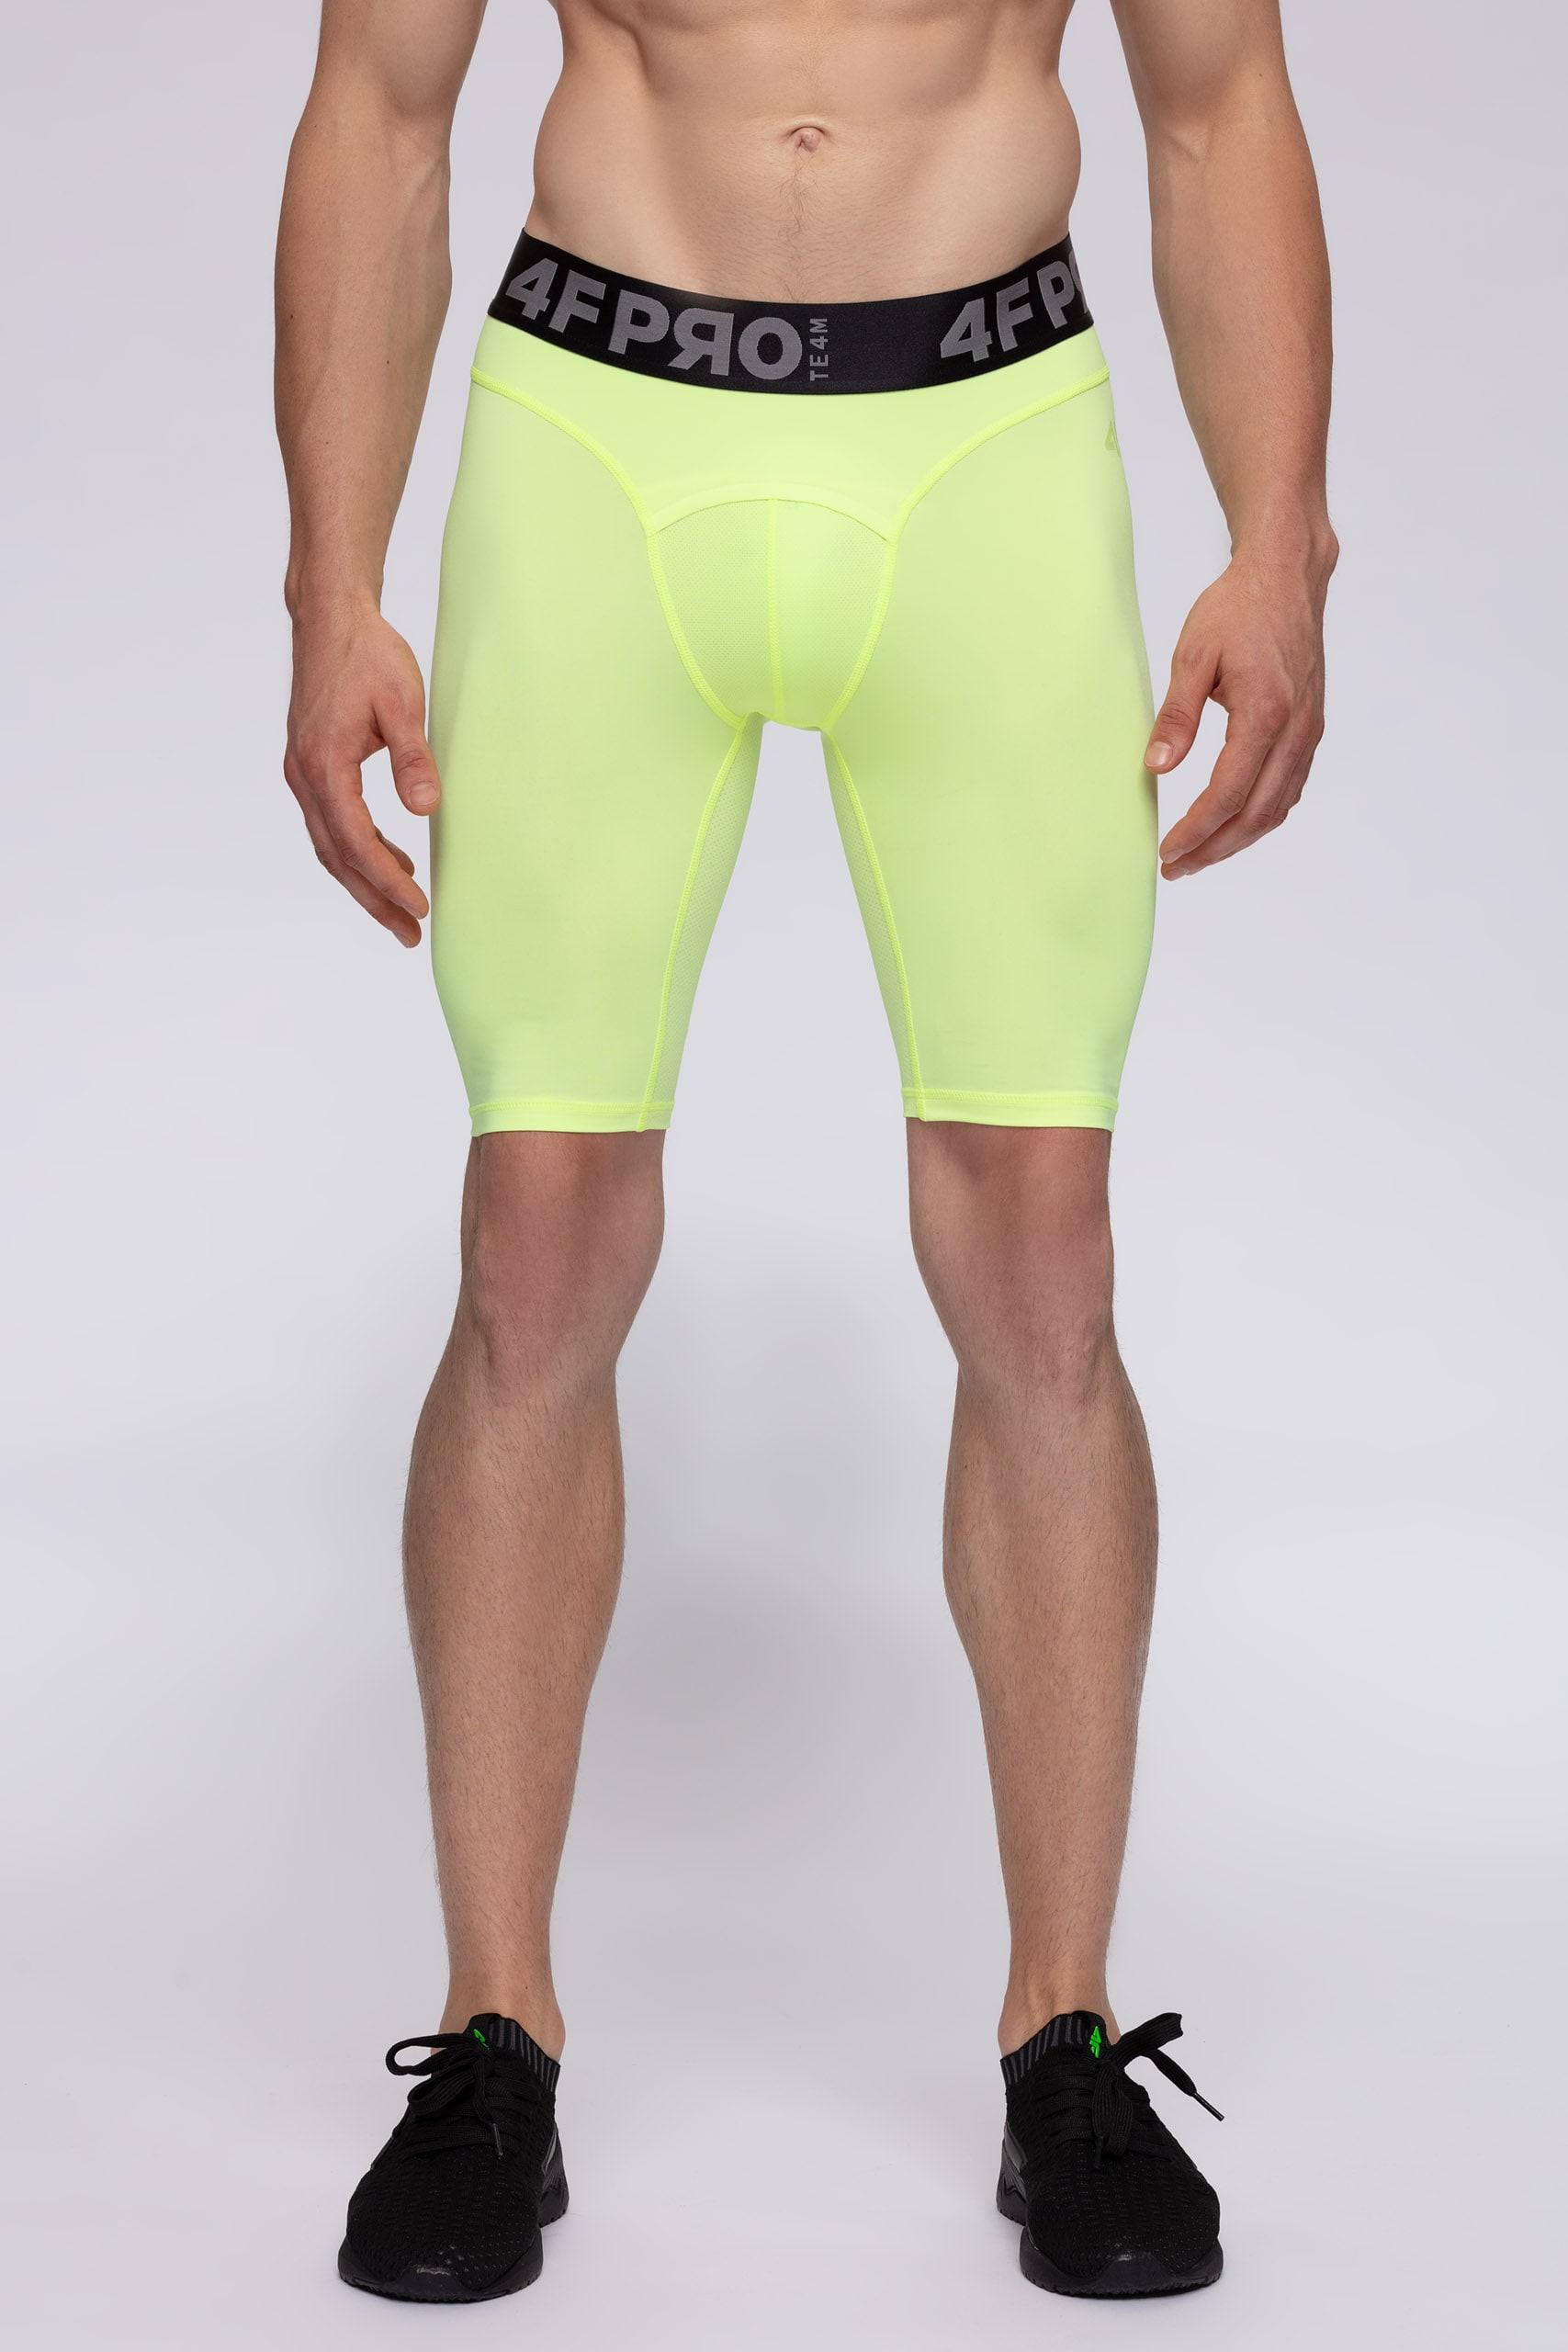 Imagine Pantaloni Scurti Baselayer Pentru Barbati 4fpro Spmf406 Galben